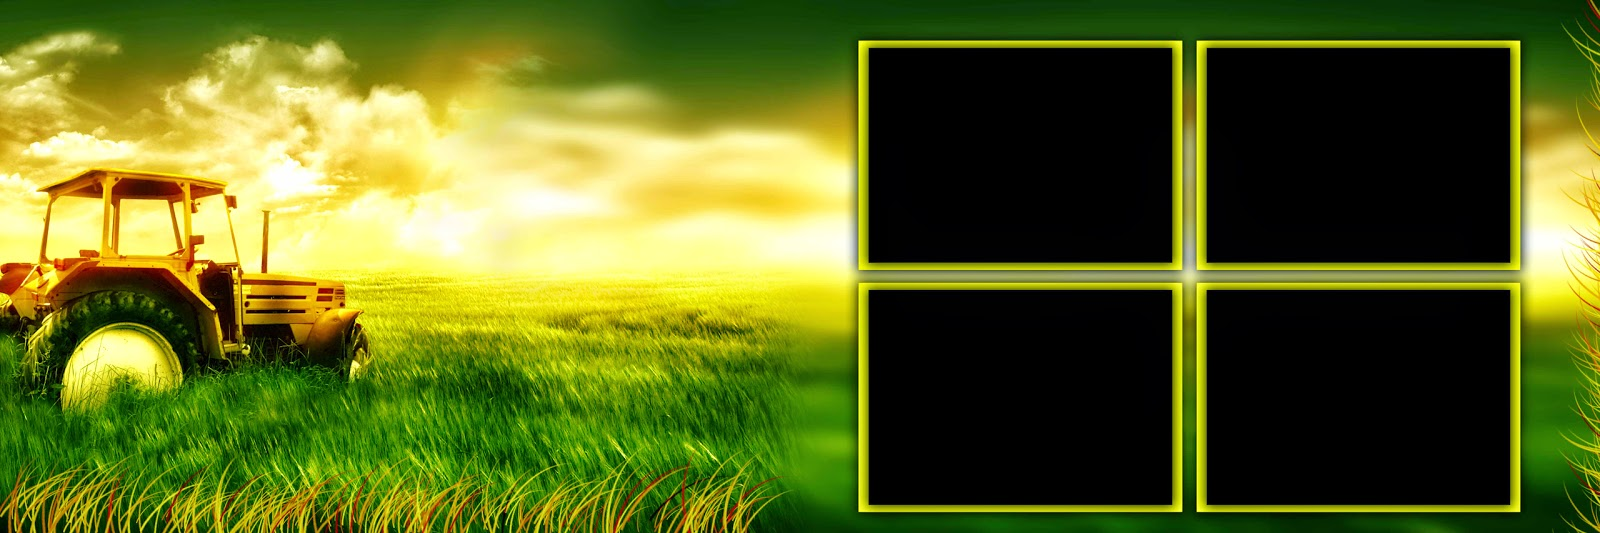 Adobe photoshop psd templates gold ring : smurnurbo